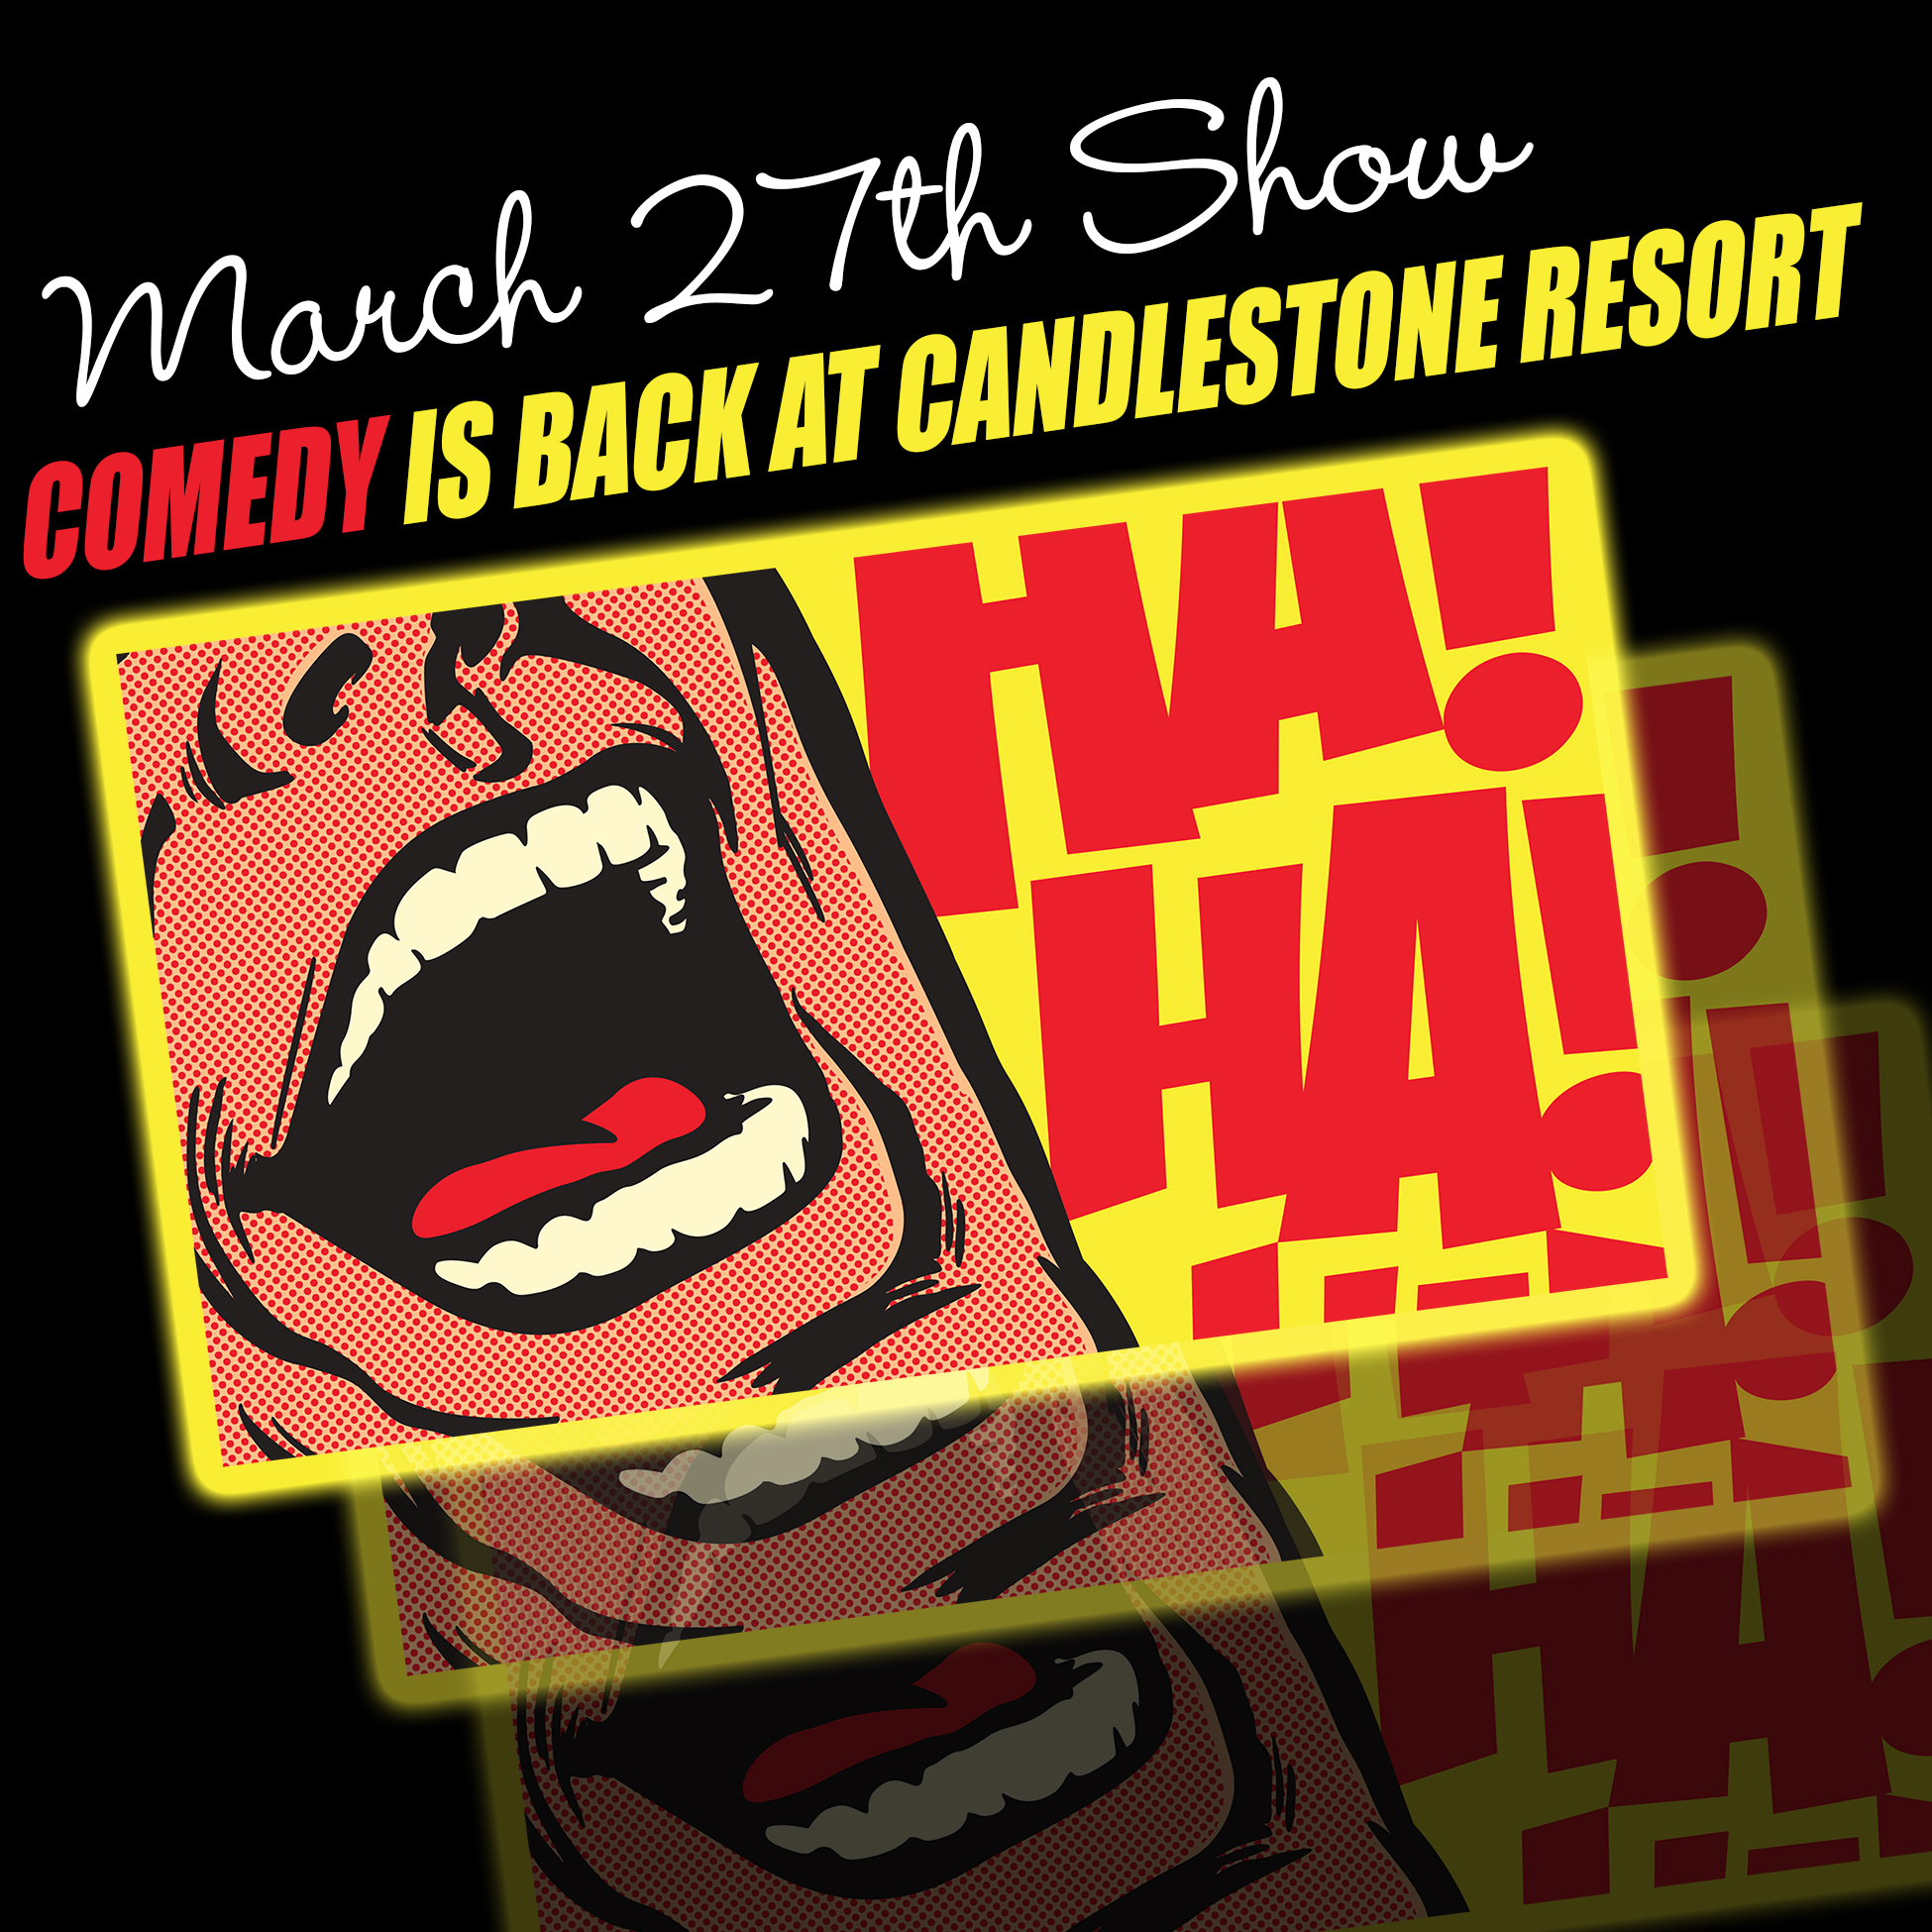 March 27th Comedy Show 2020-Comedy-Mar27th